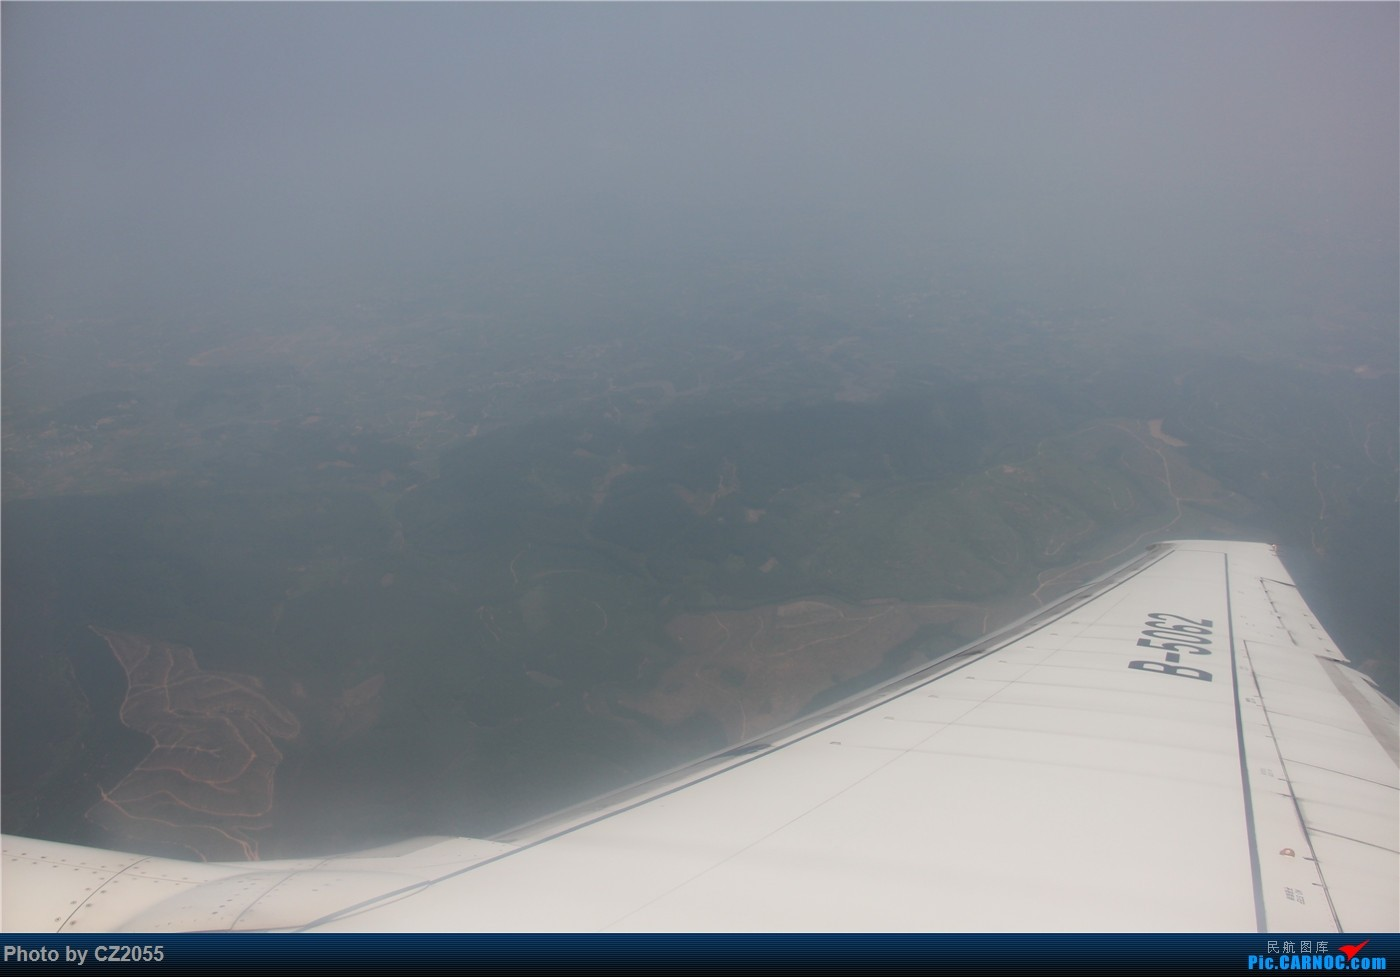 Re:[原创]【广东青少年拍机小队】【C-Z-2055(1)】Aug.8.2015 不期而遇,相伴相惜。首次体验SKYTRAX五星航空公司-海南航空。